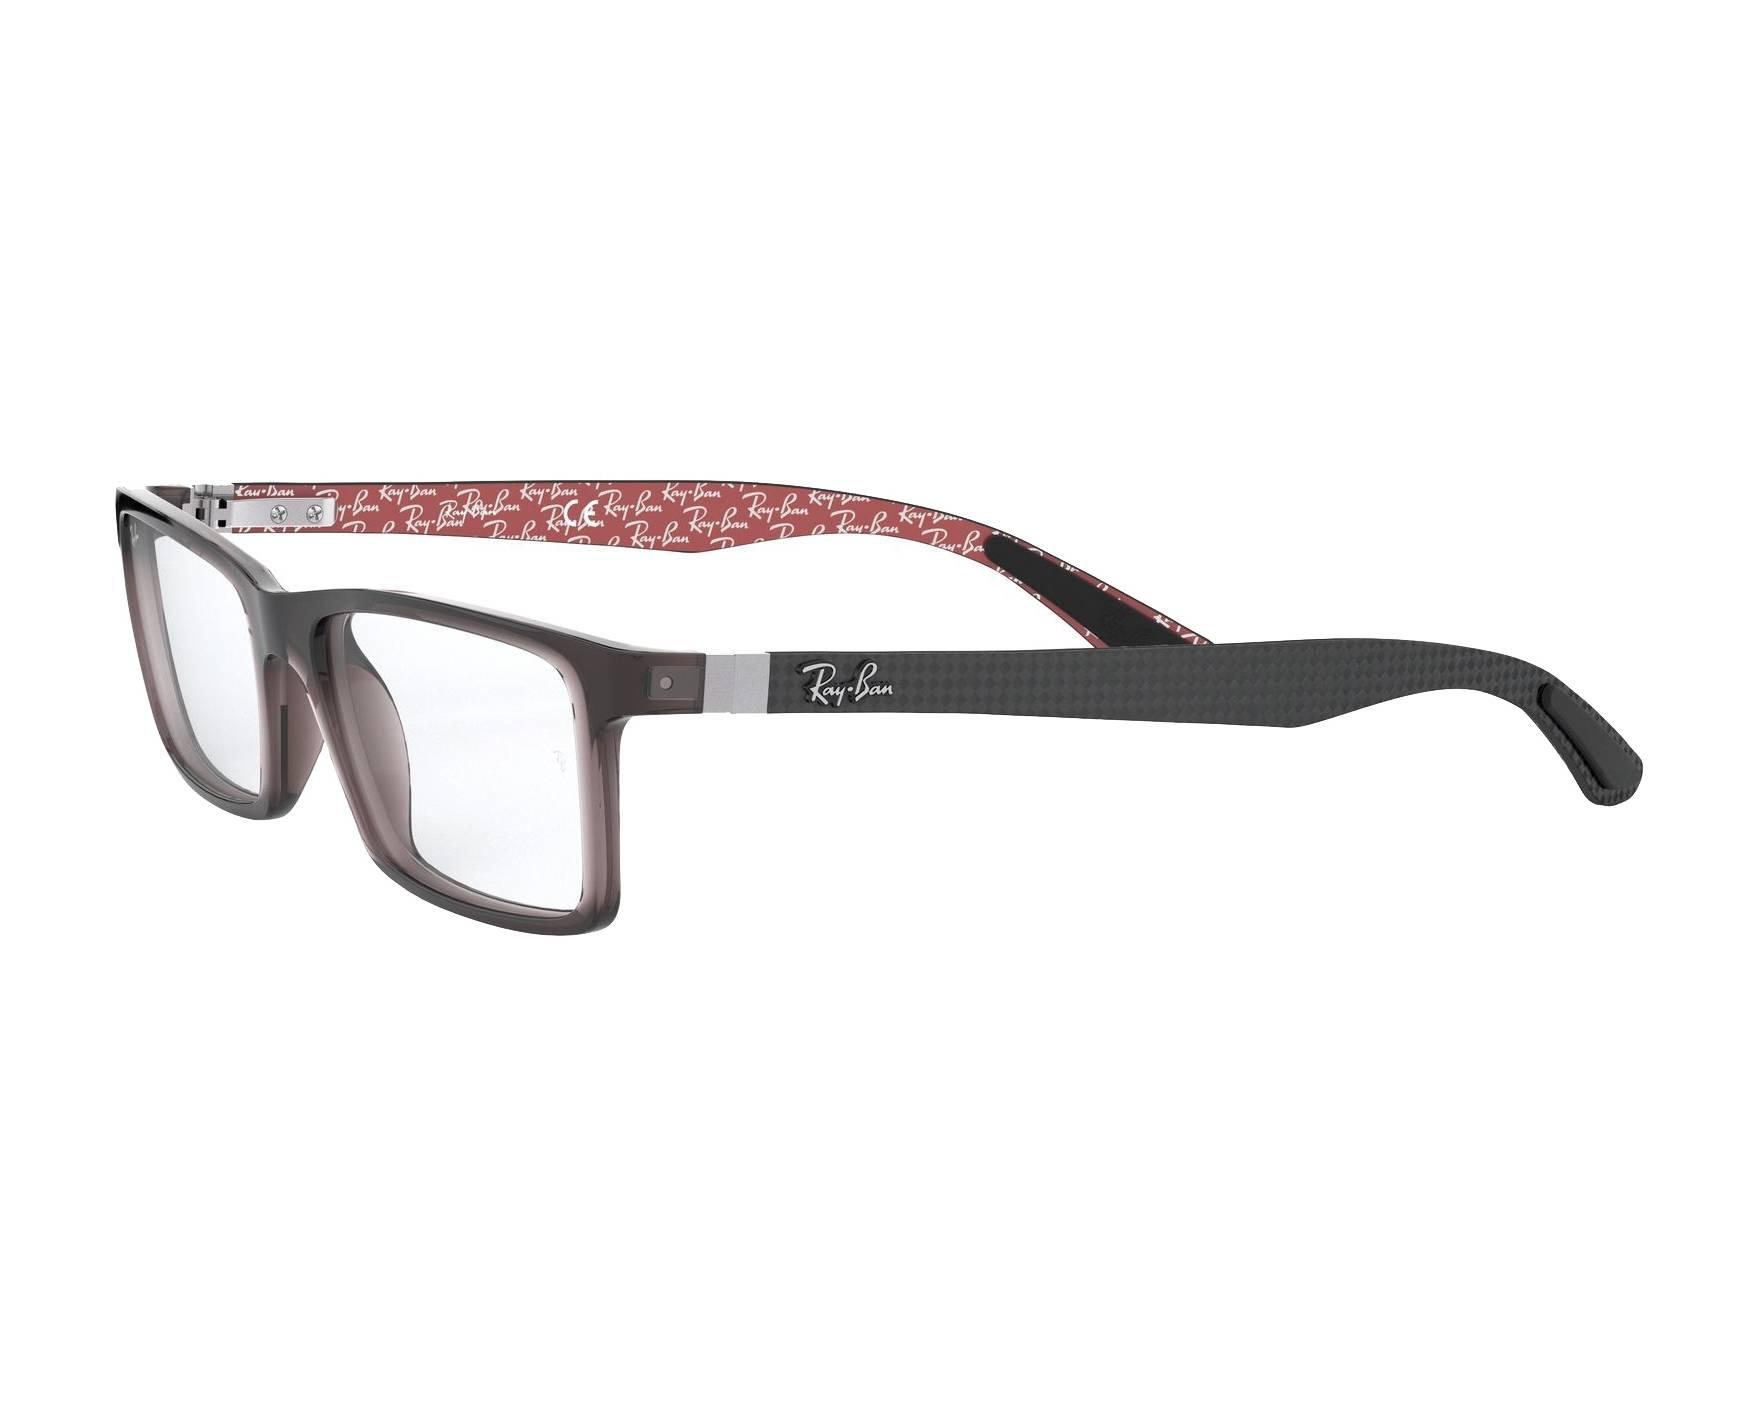 09fed326df eyeglasses Ray-Ban RX-8901 5845 53-17 Grey Grey 360 degree view